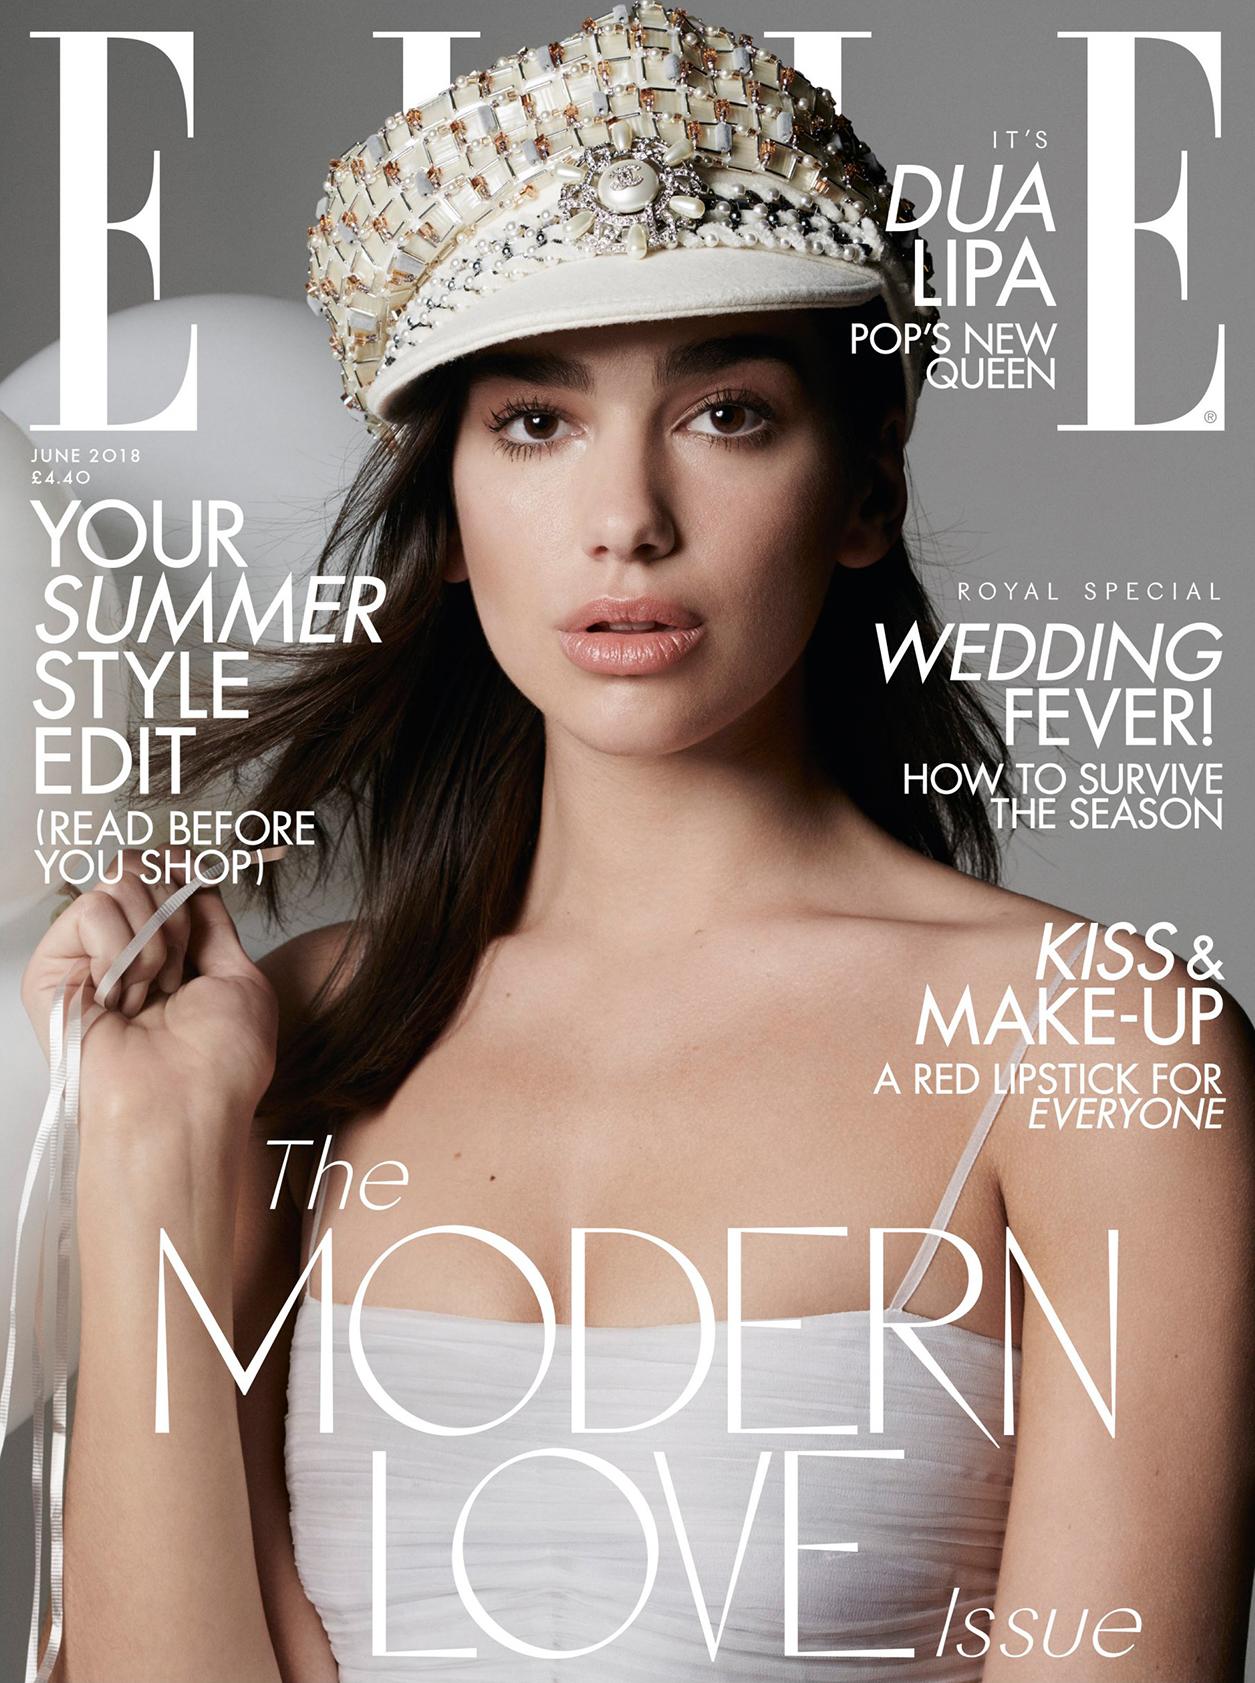 Dua Lipa by Liz Collins for Elle UK June 2018 (2).jpg